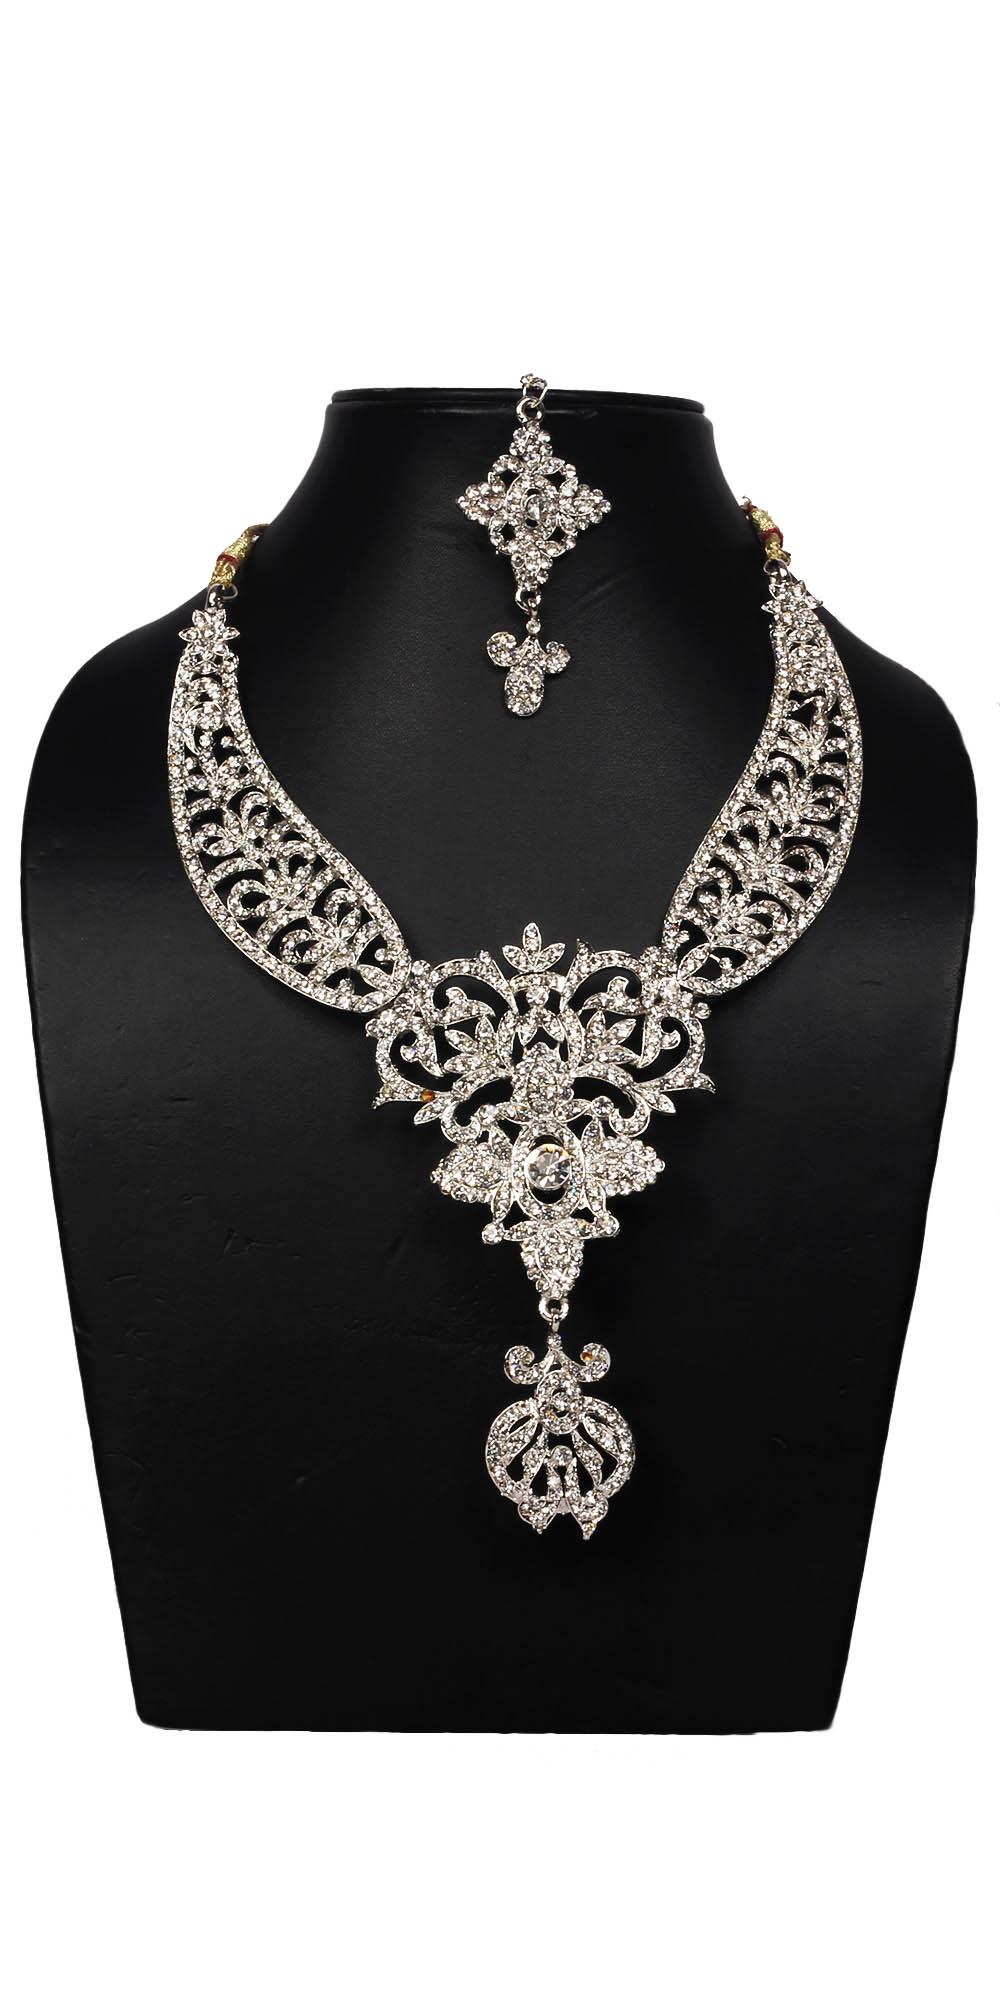 Buy Stunning Huge American Diamond Jewellery Set Online India   Voylla